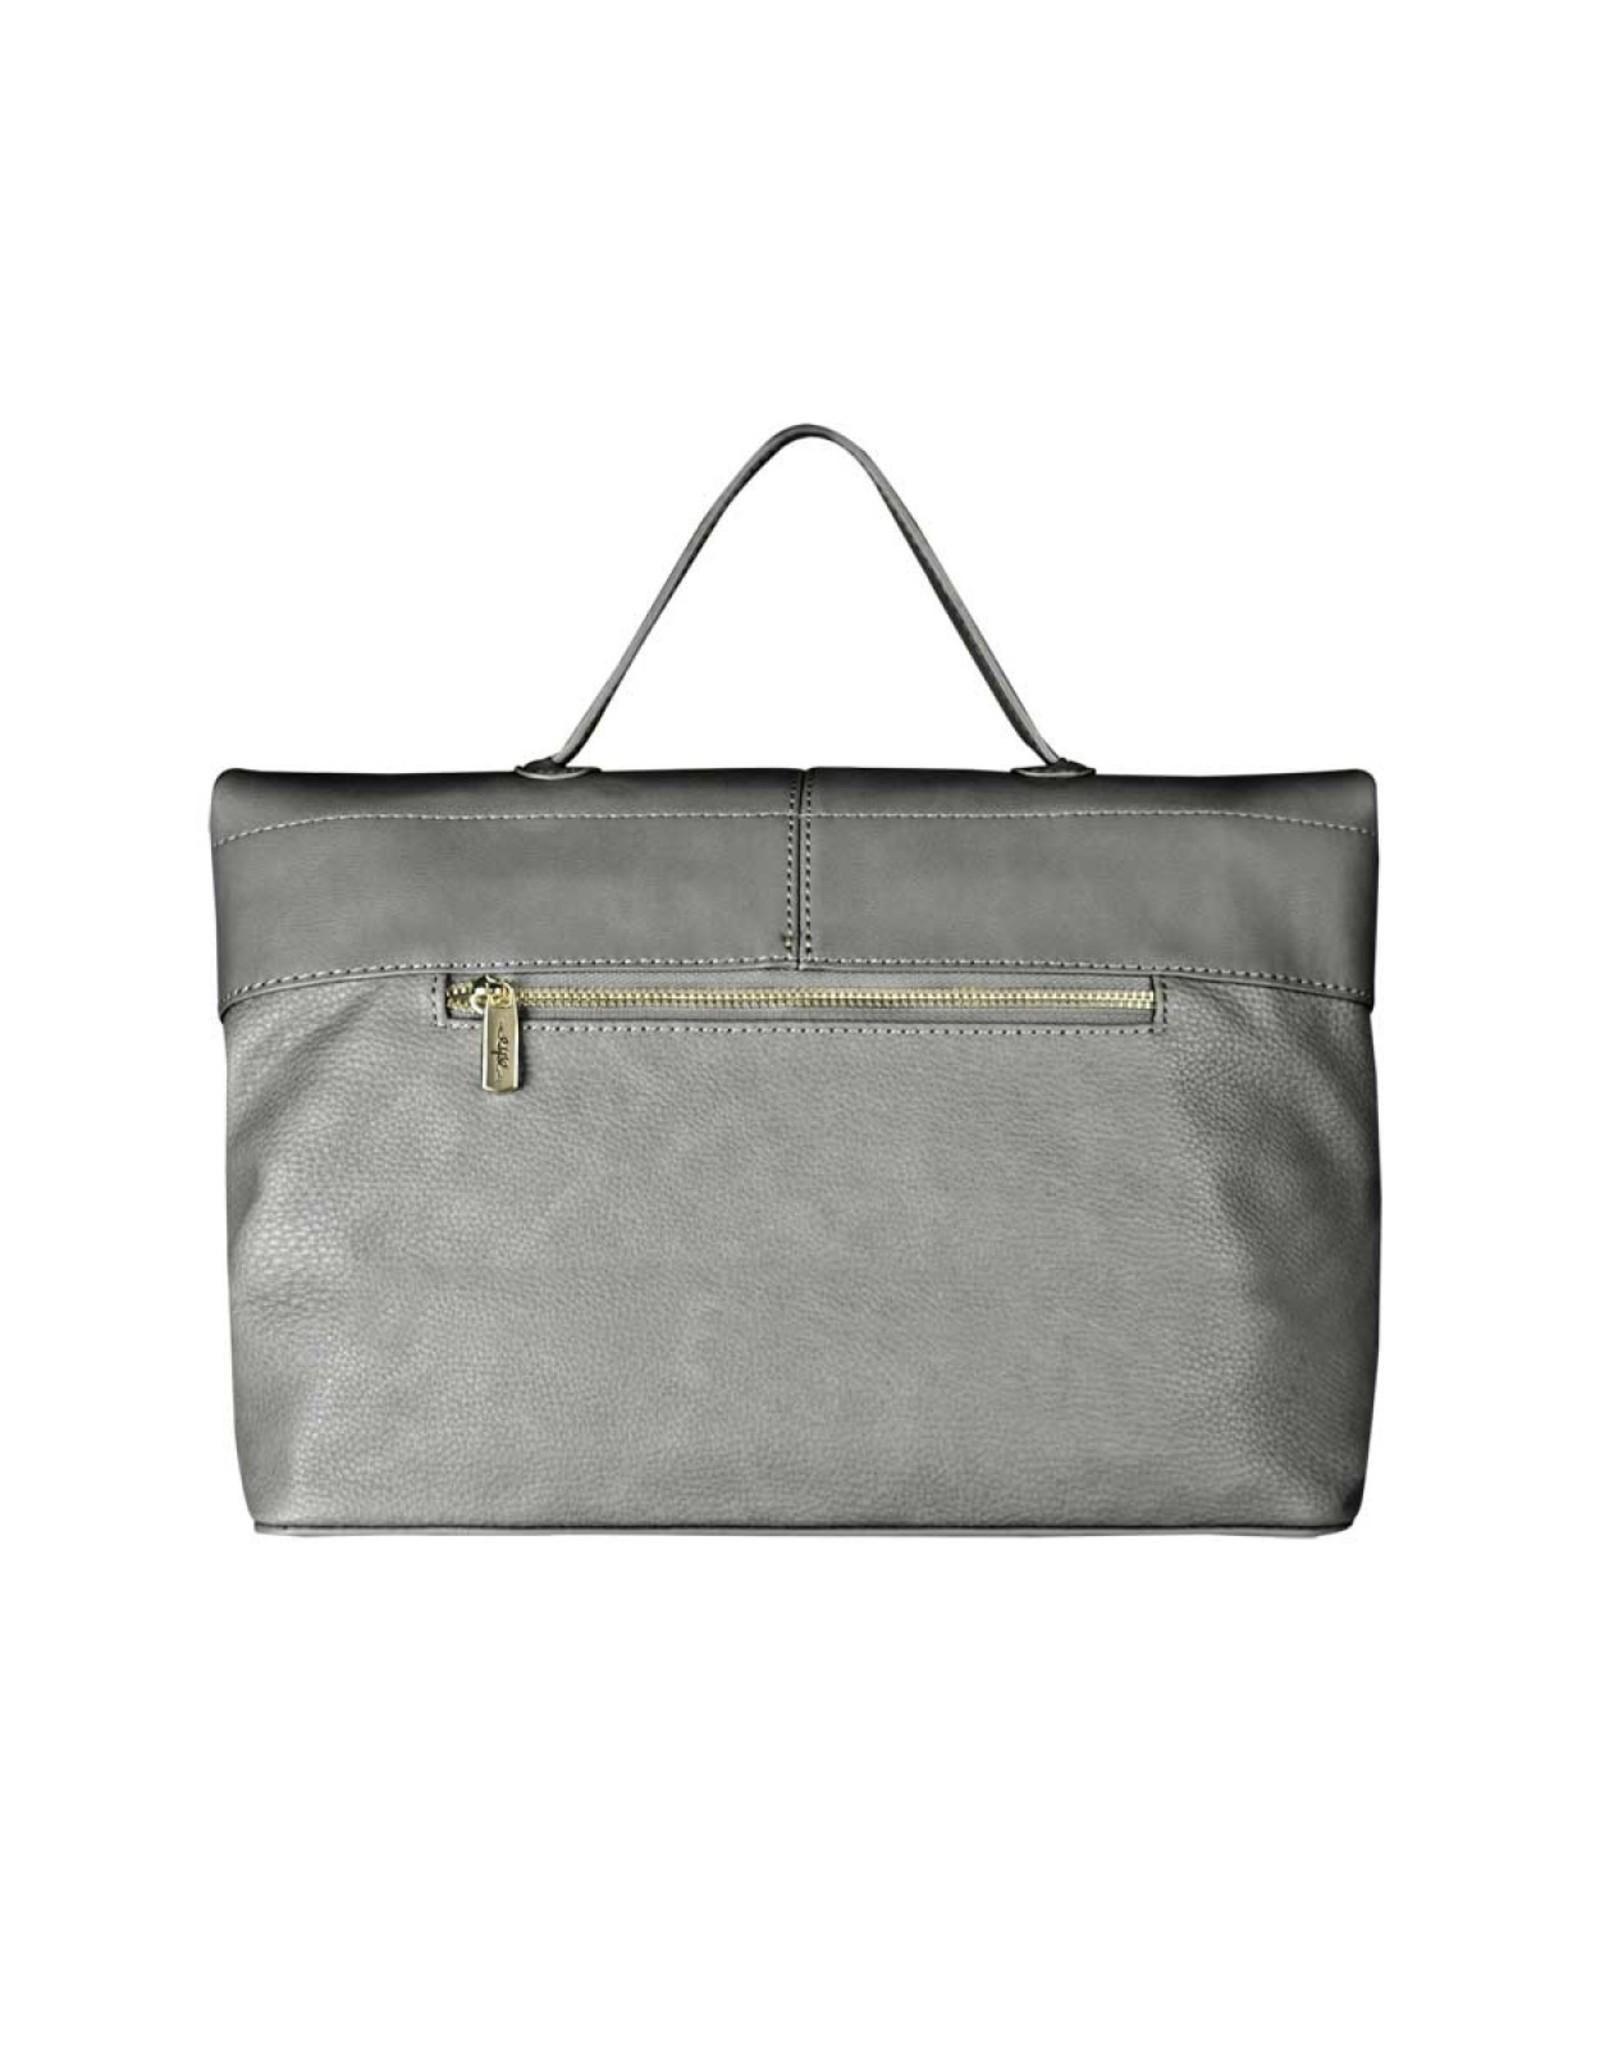 Style Satchel, Grey